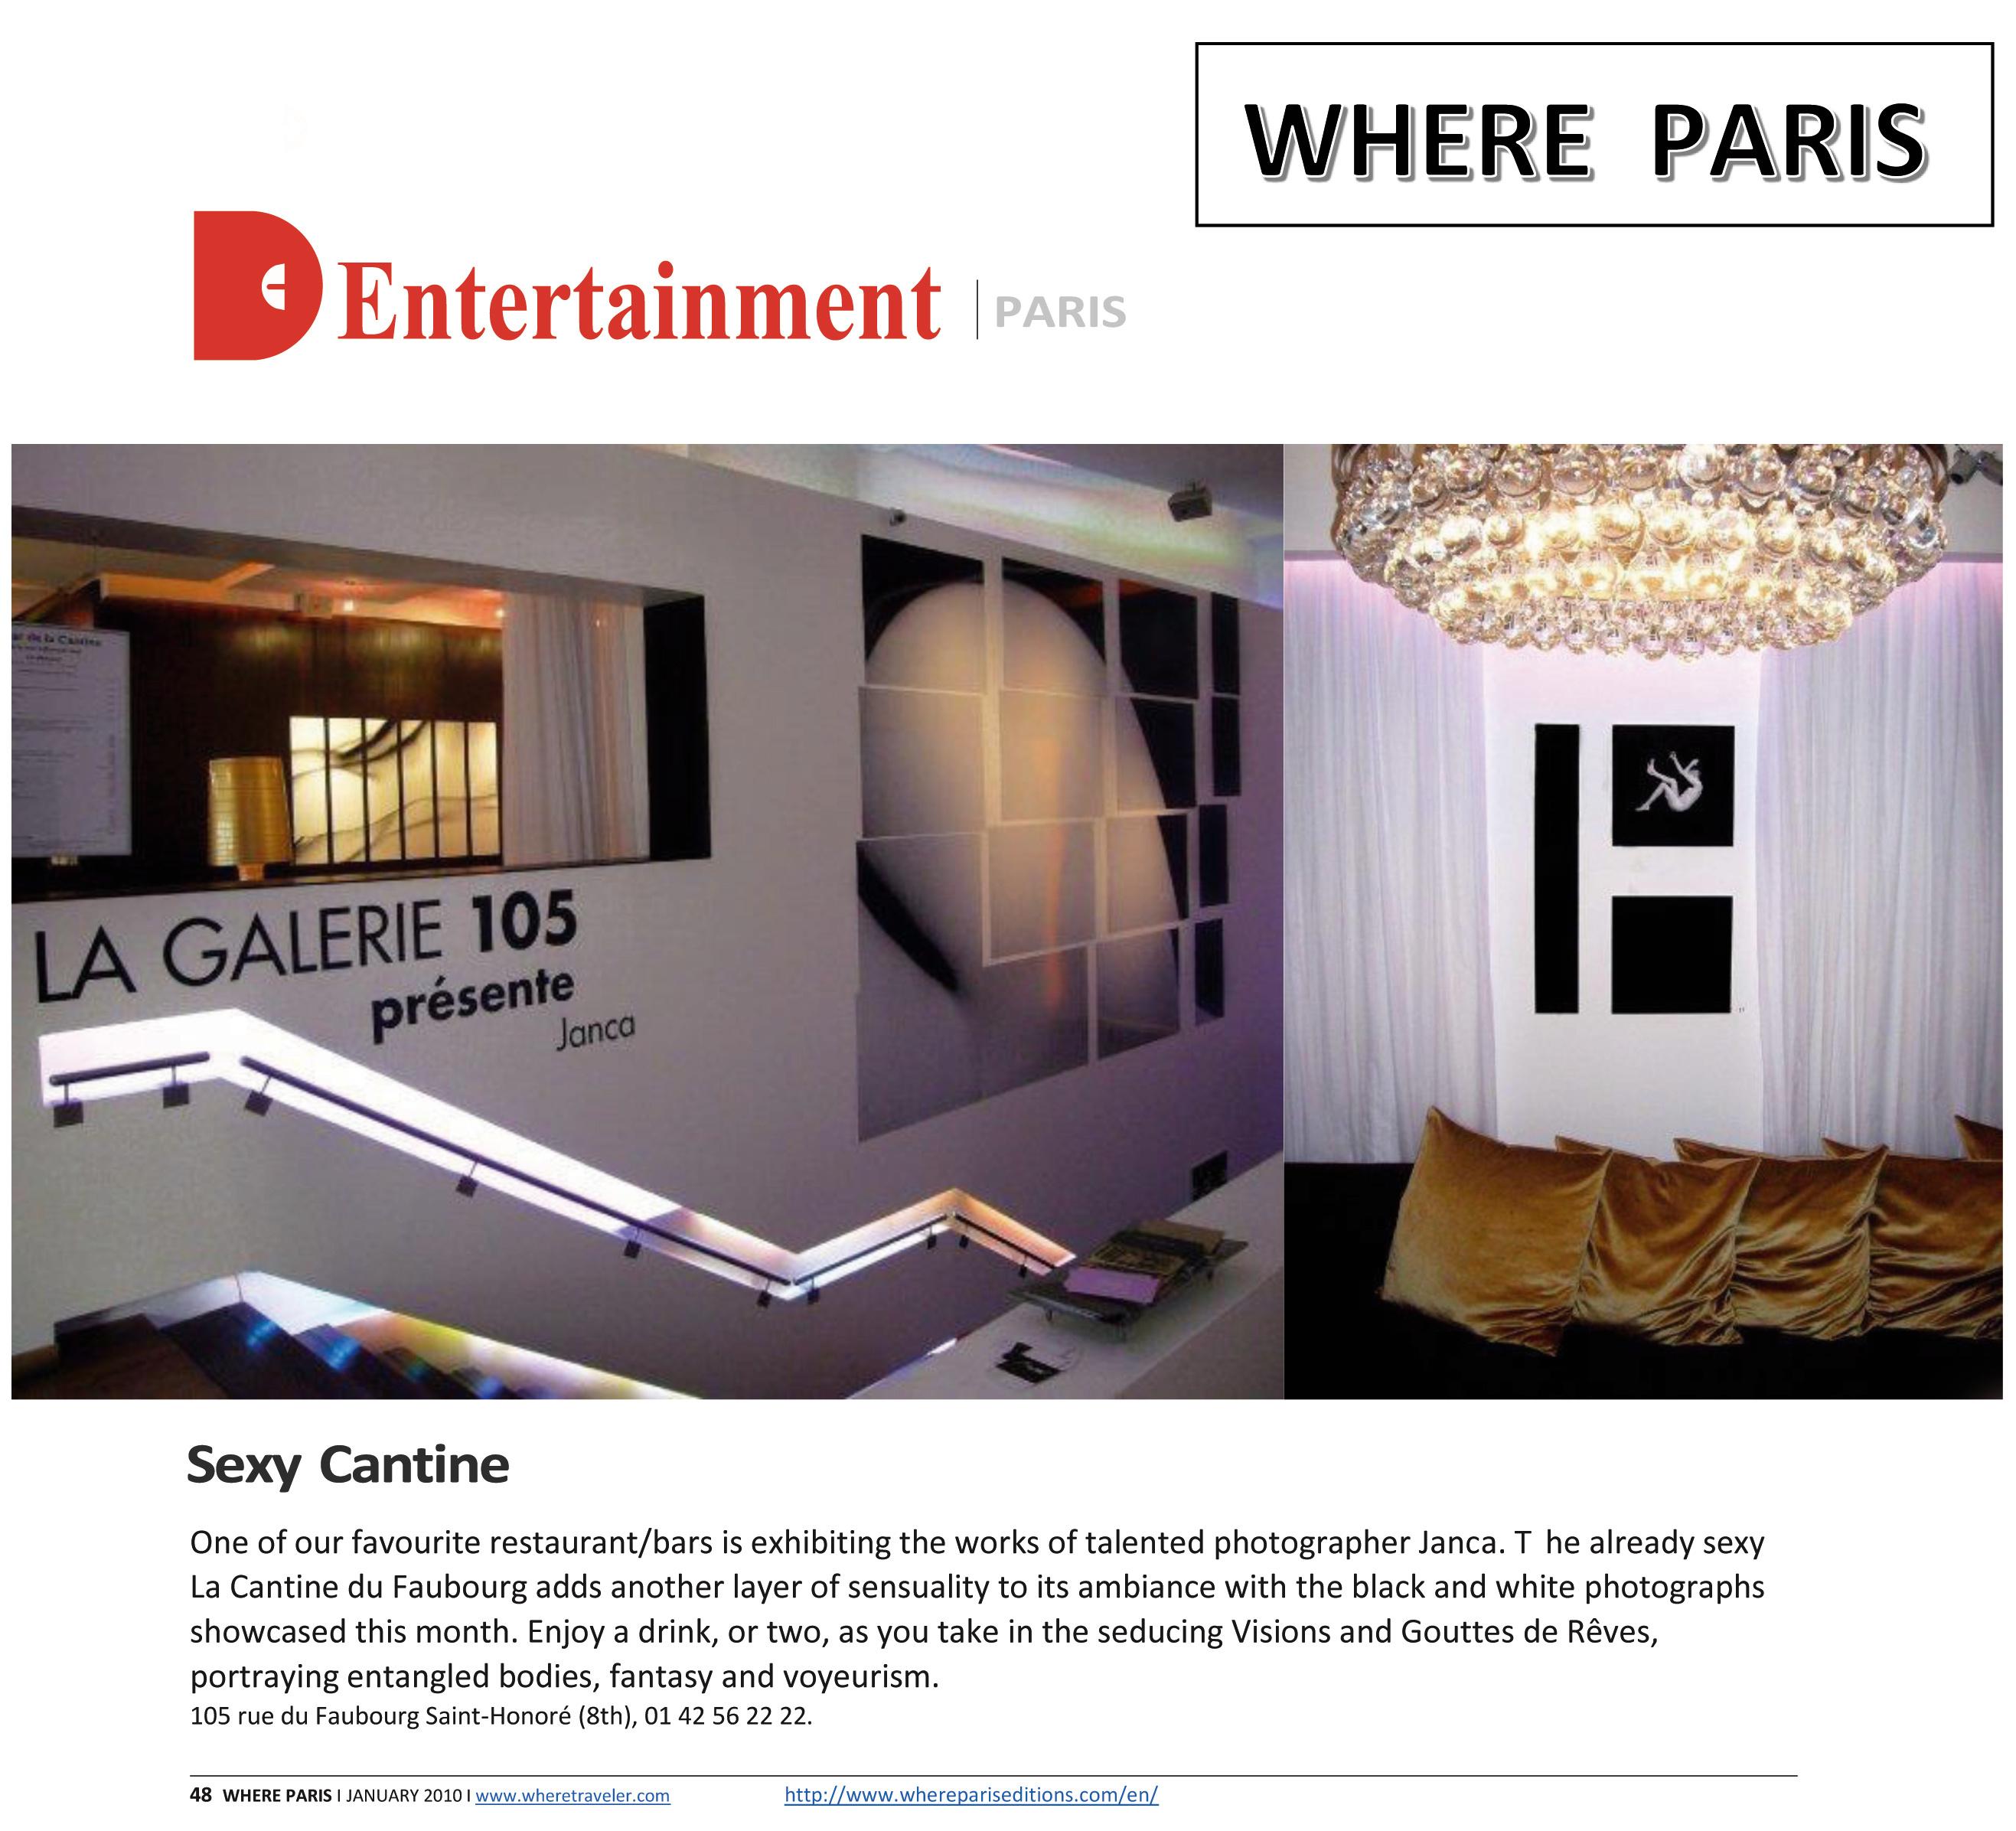 press - 2010 - PARIS  WHERE